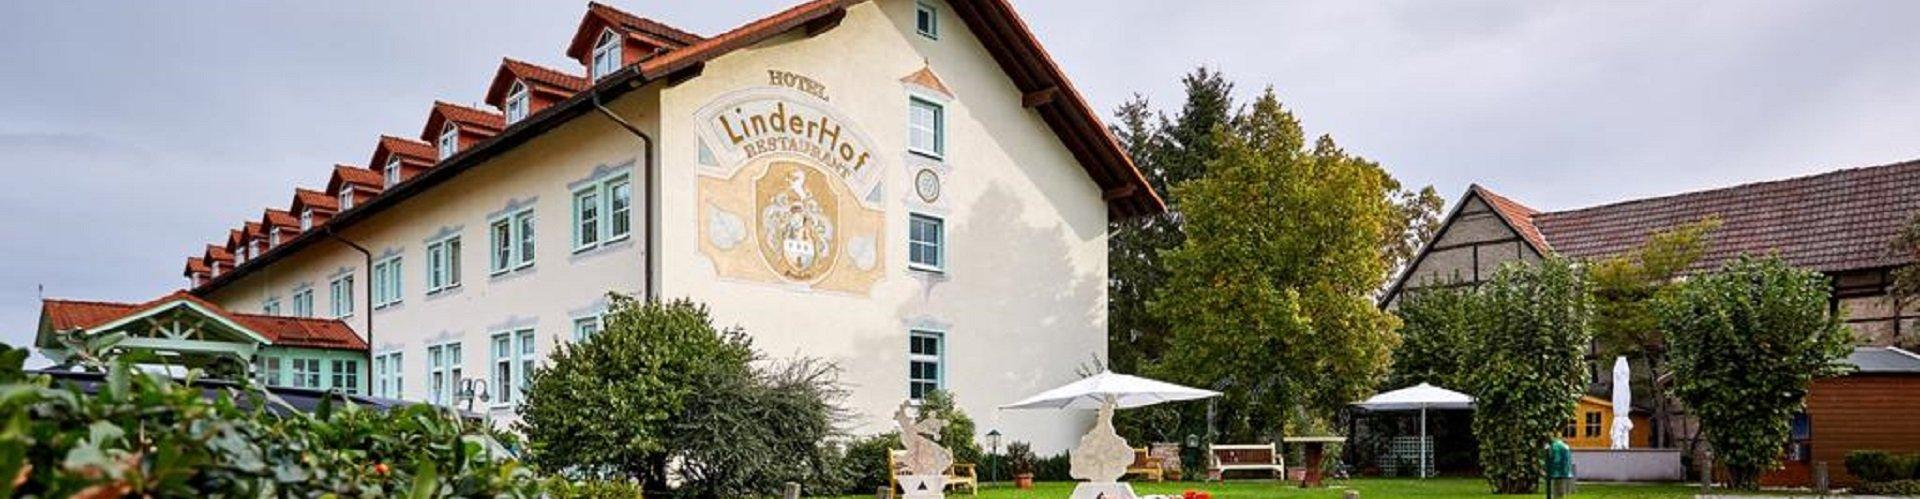 Bannerfoto Hotel Linderhof in Erfurt